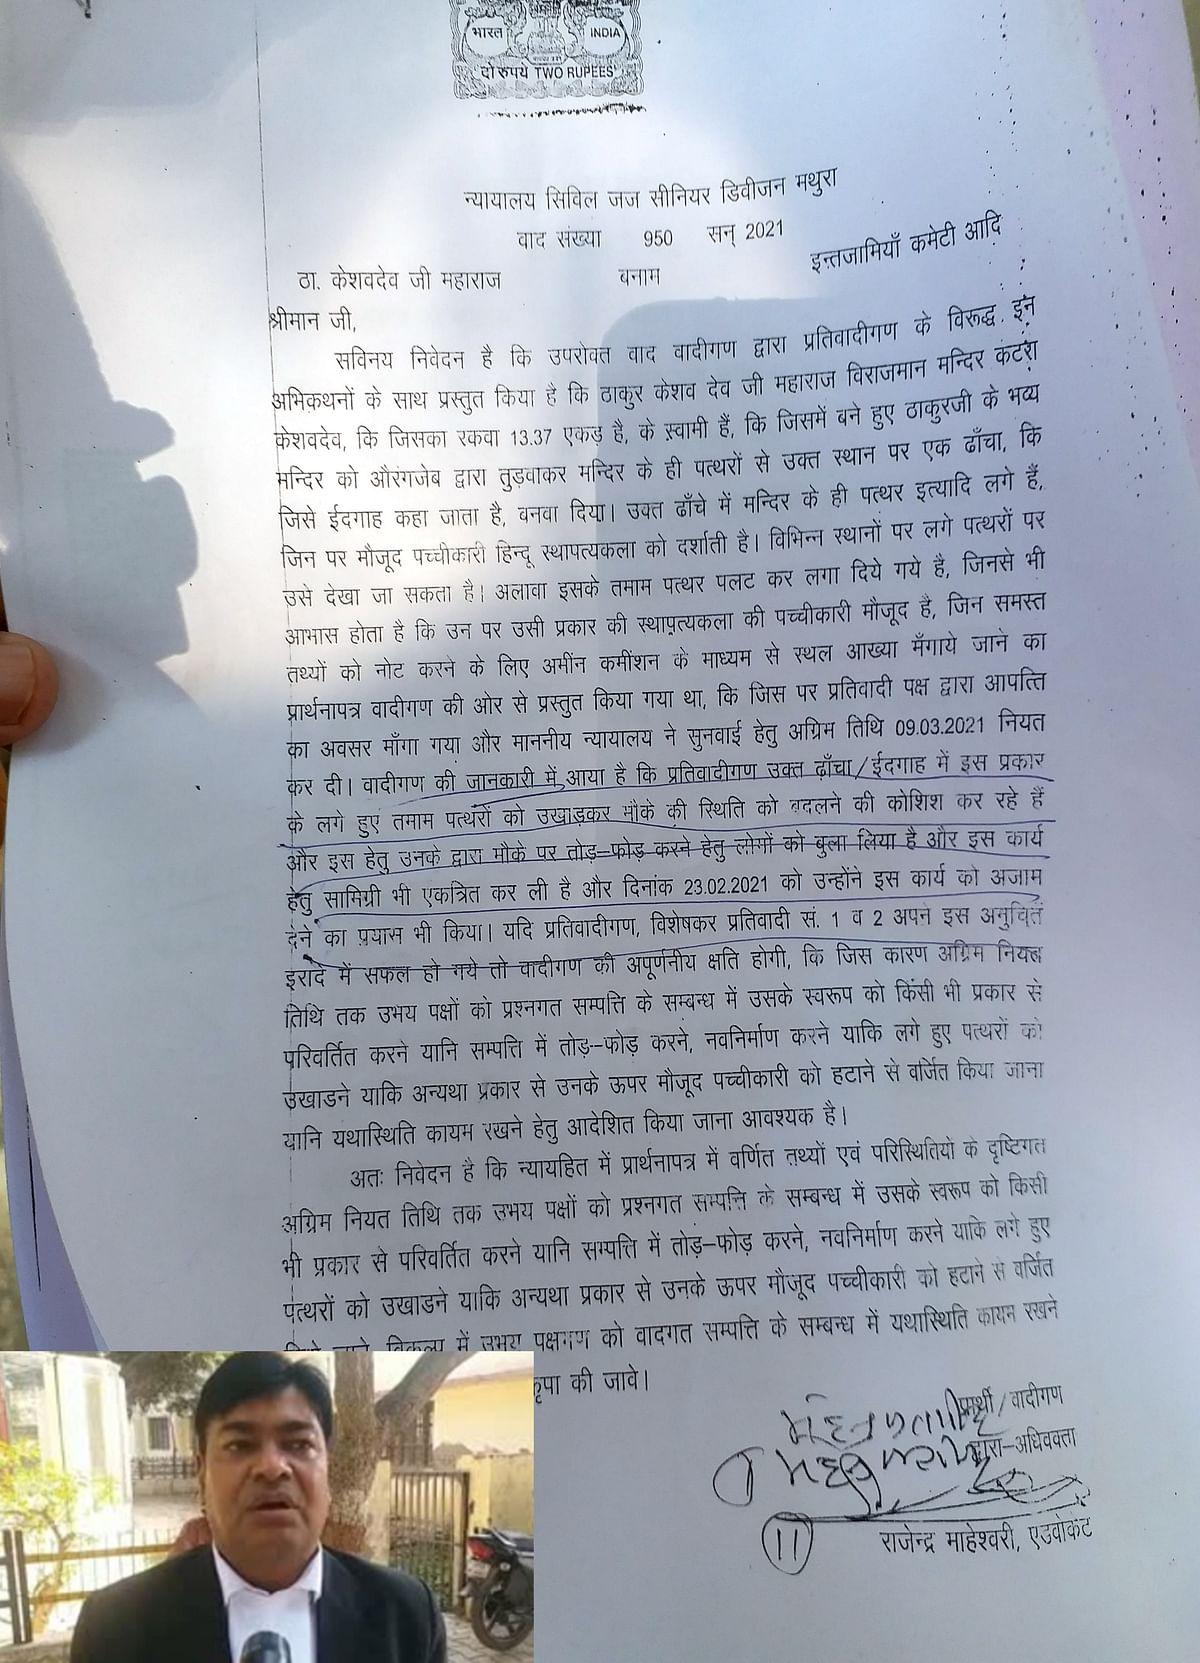 श्रीकृष्ण जन्मभूमि मामला: नए प्रार्थना पत्र पर कोर्ट ने सुरक्षित रखा आदेश, सुनवाई 9 मार्च को